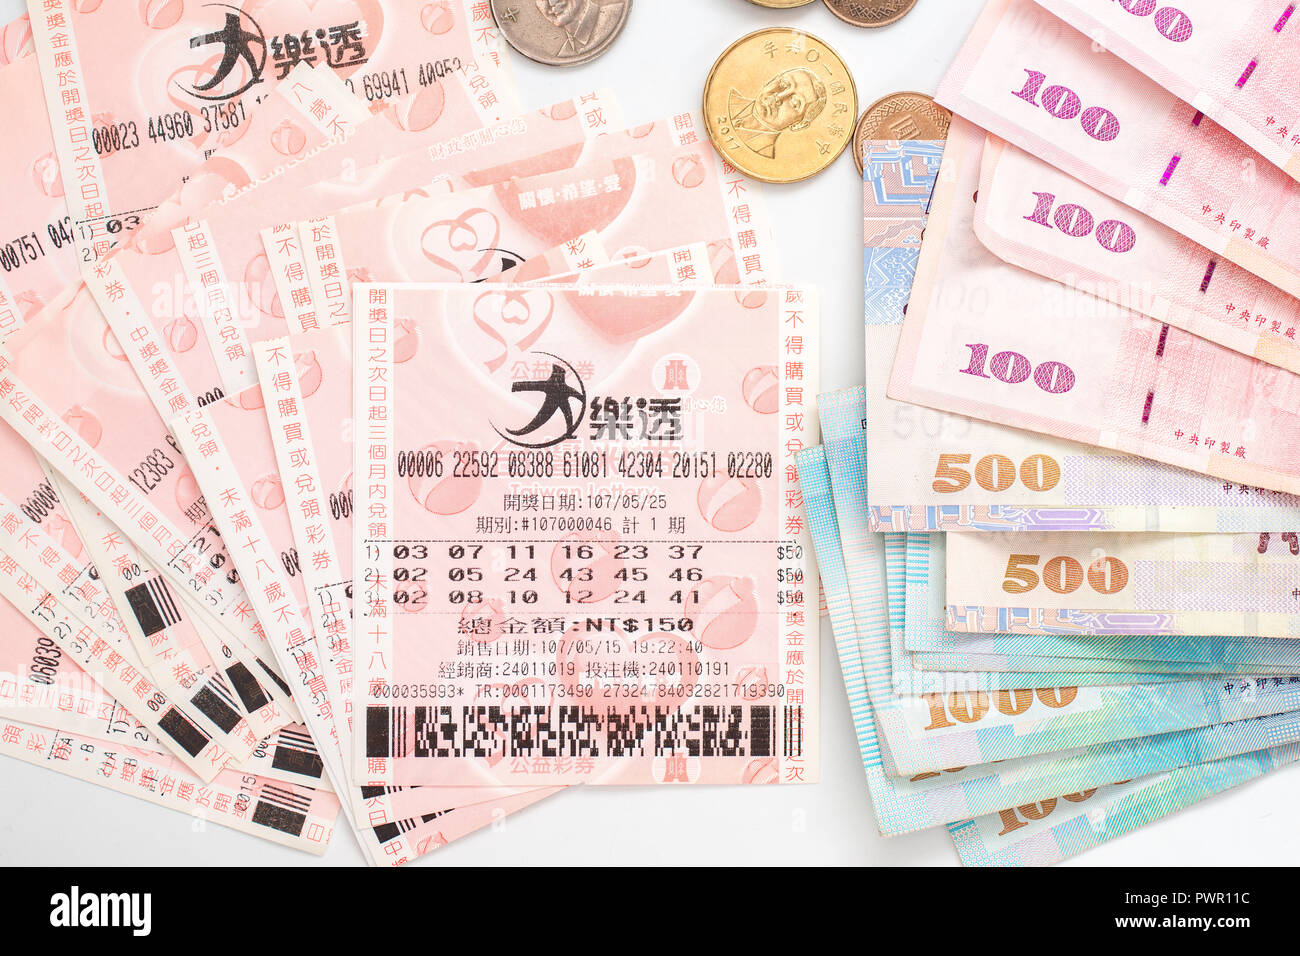 Taipei, Taiwan - 7 Oct 2018: Closeup of Taiwanese currency